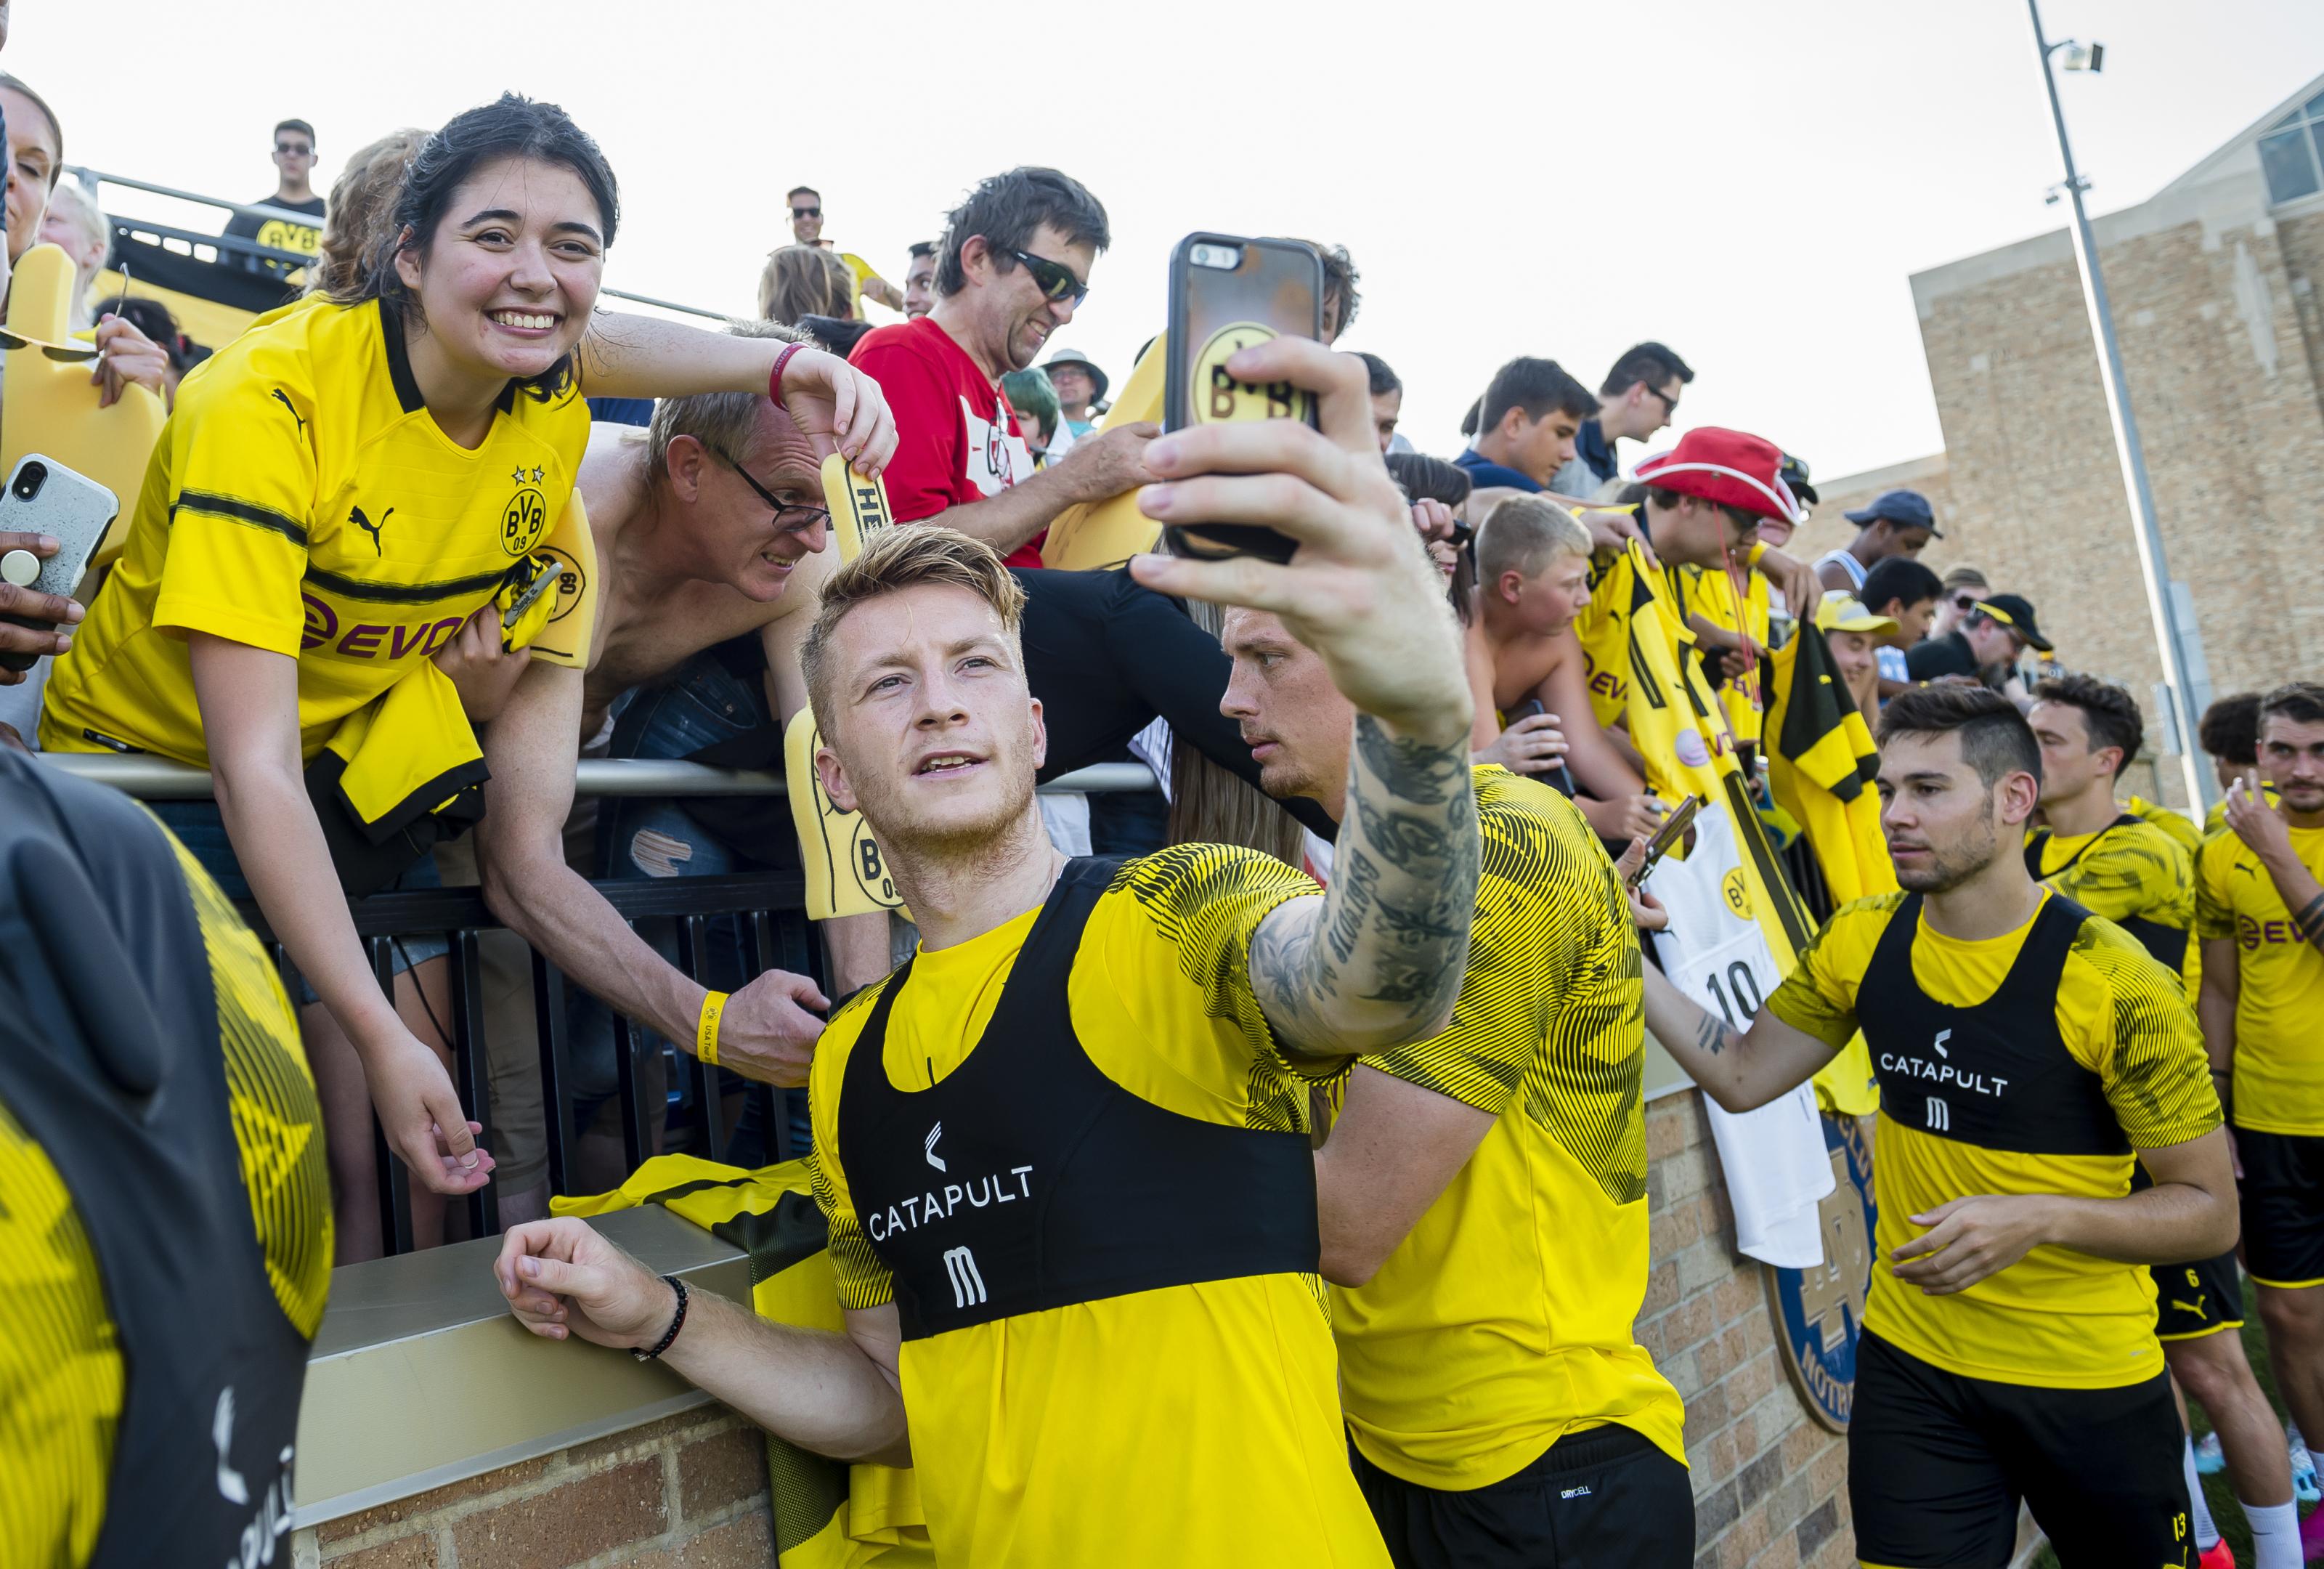 Borussia Dortmund's USA Tour 2019: The importance of playing ...